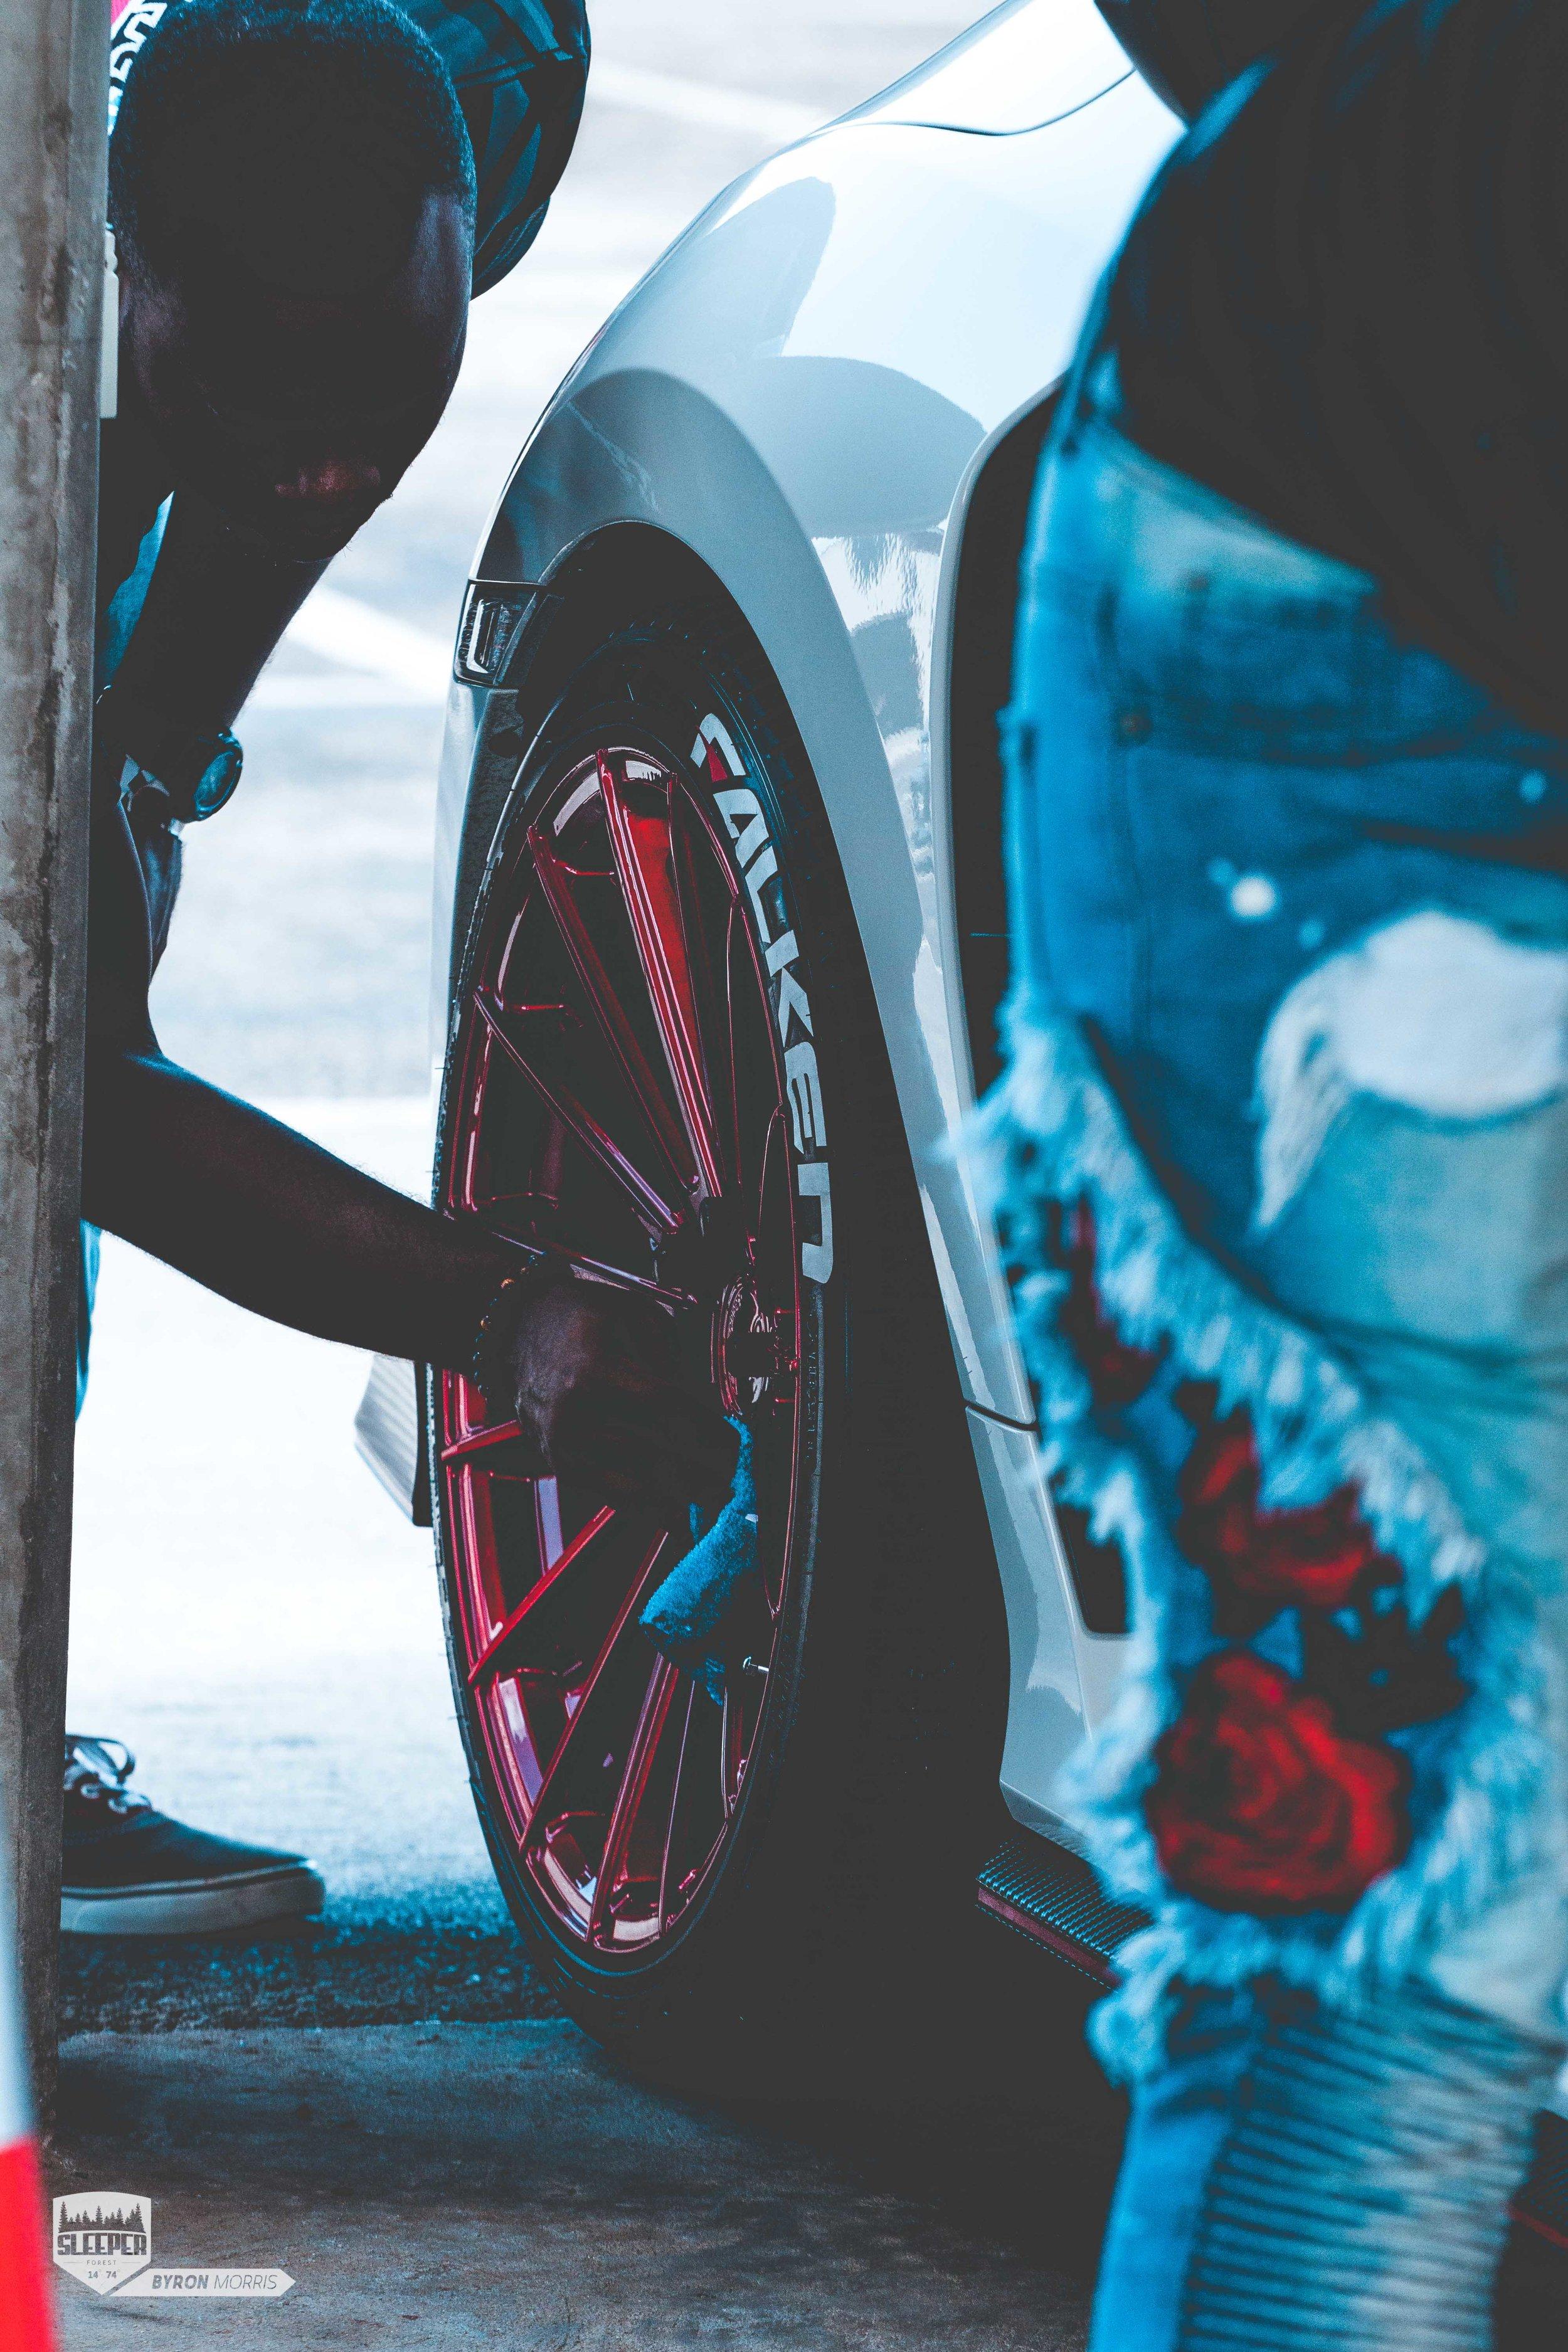 Rep_ya_ride_2019_barbados_car_culture.jpg